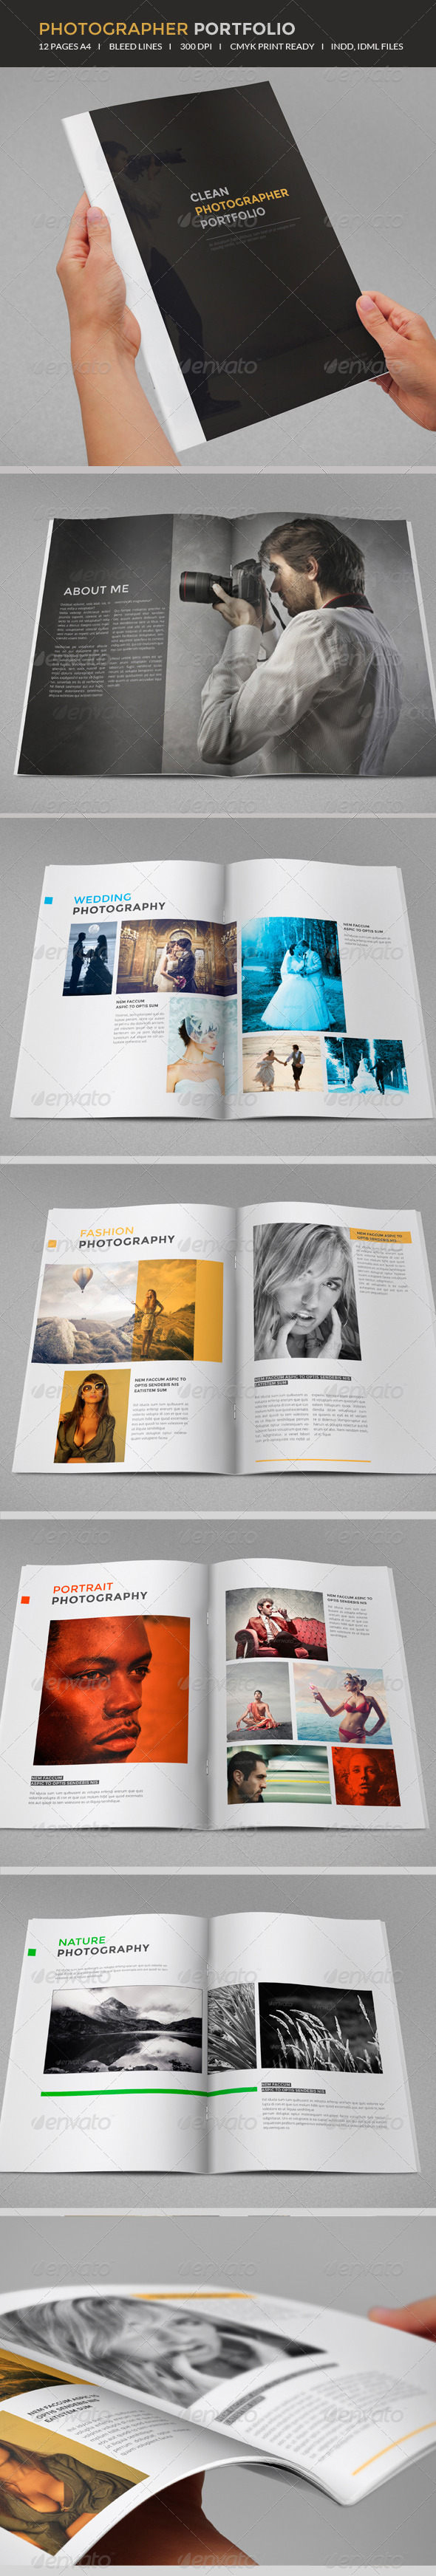 GraphicRiver Photography portfolio 6821226